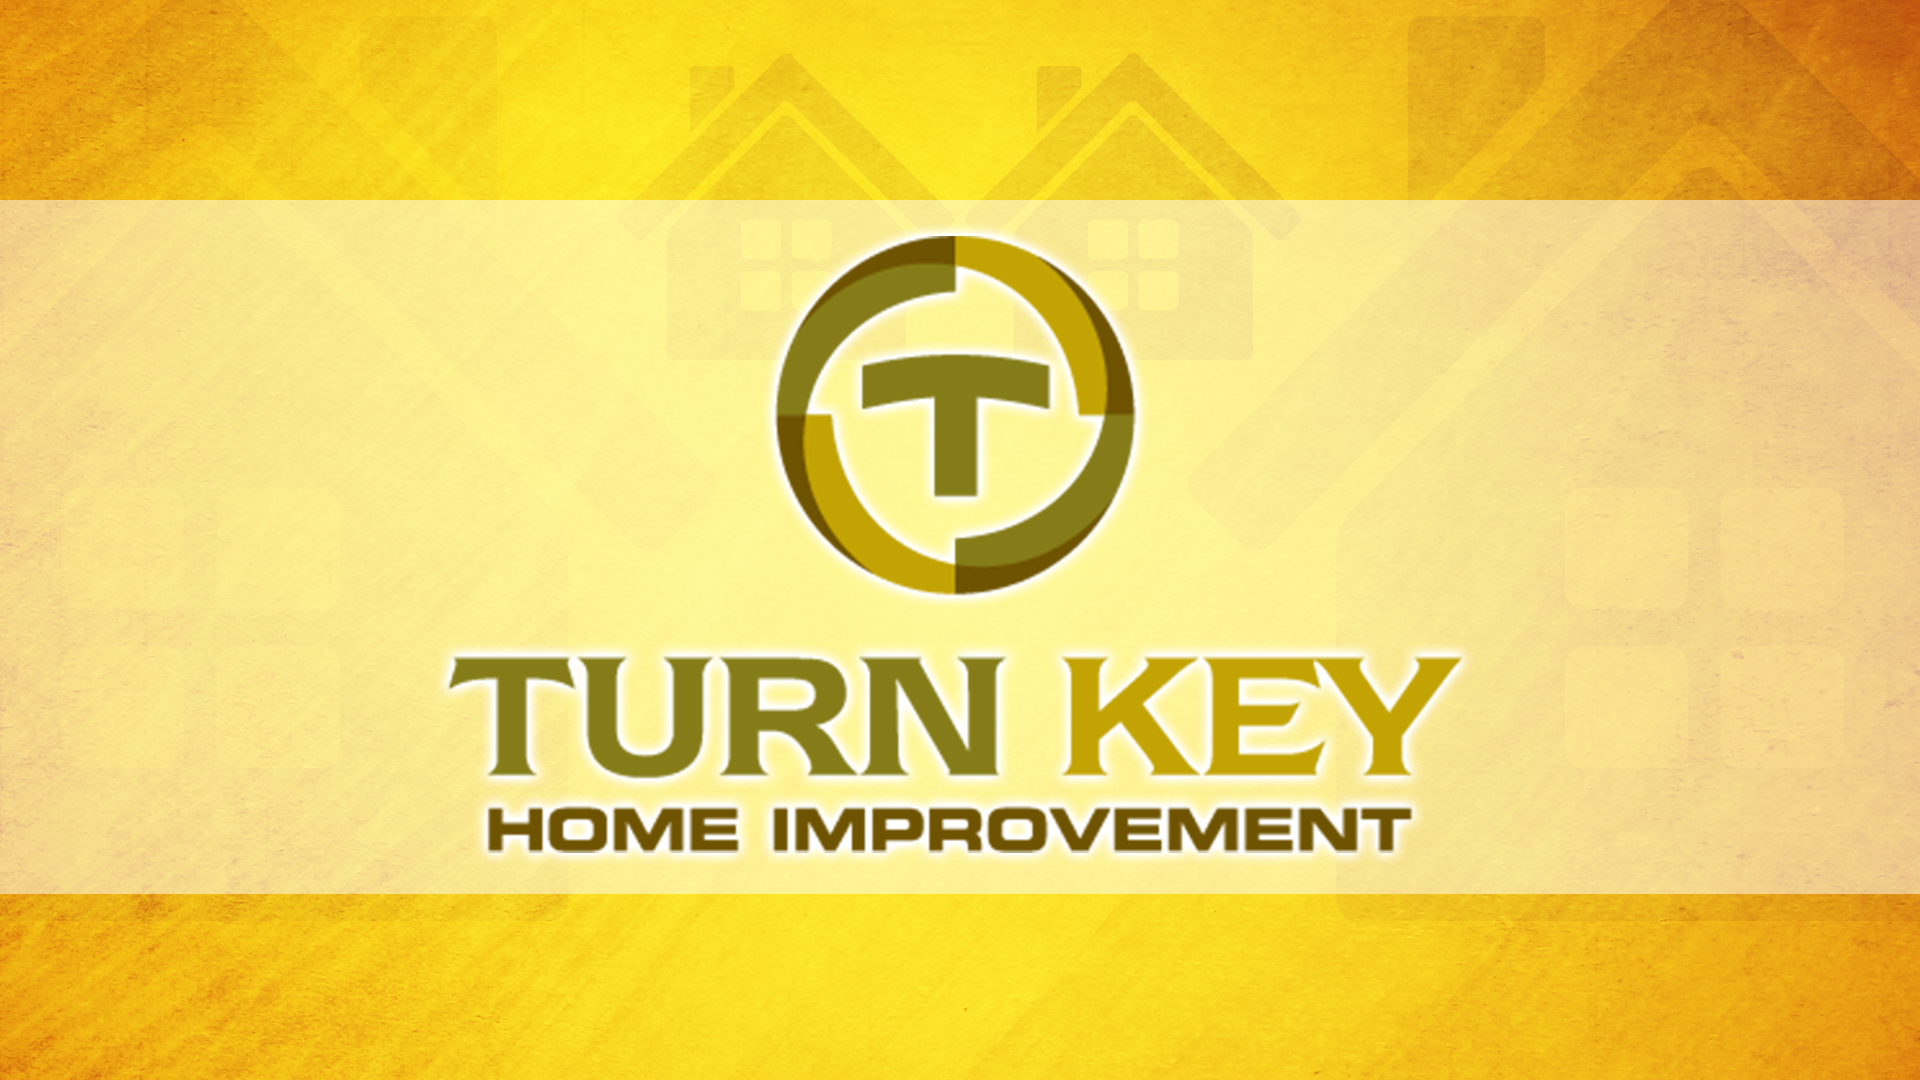 Turn Key Home improvement